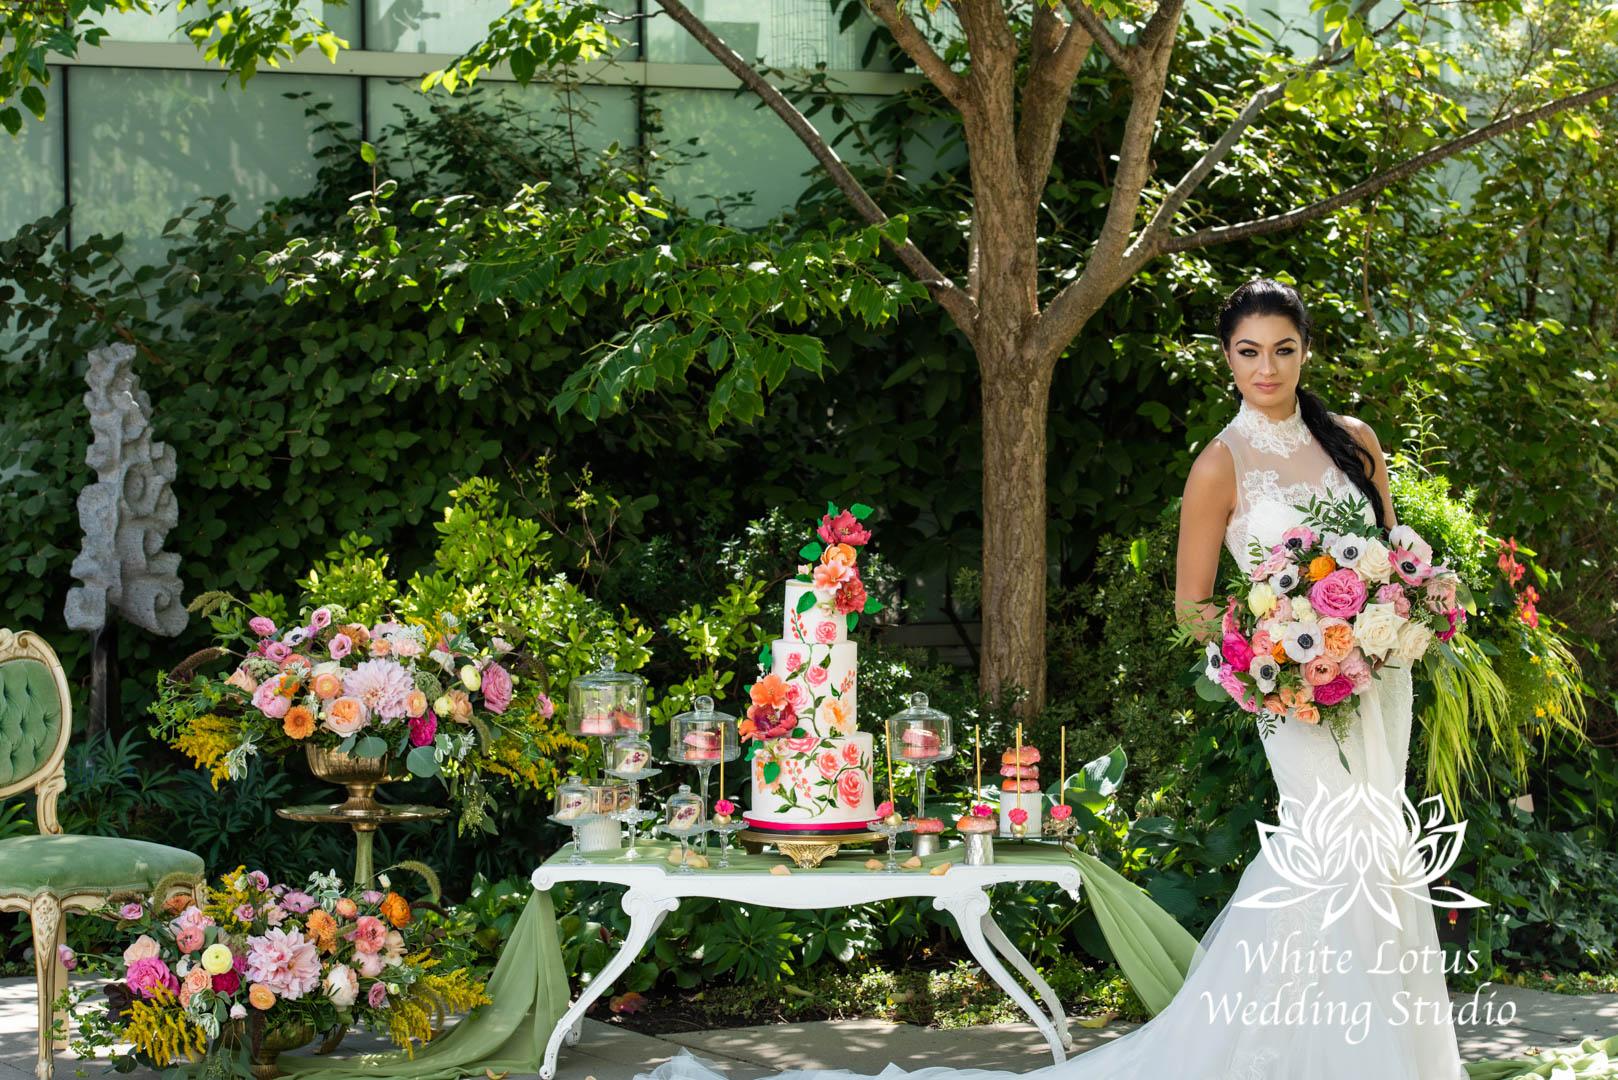 075- SPRING GARDEN WEDDING INSPIRATION